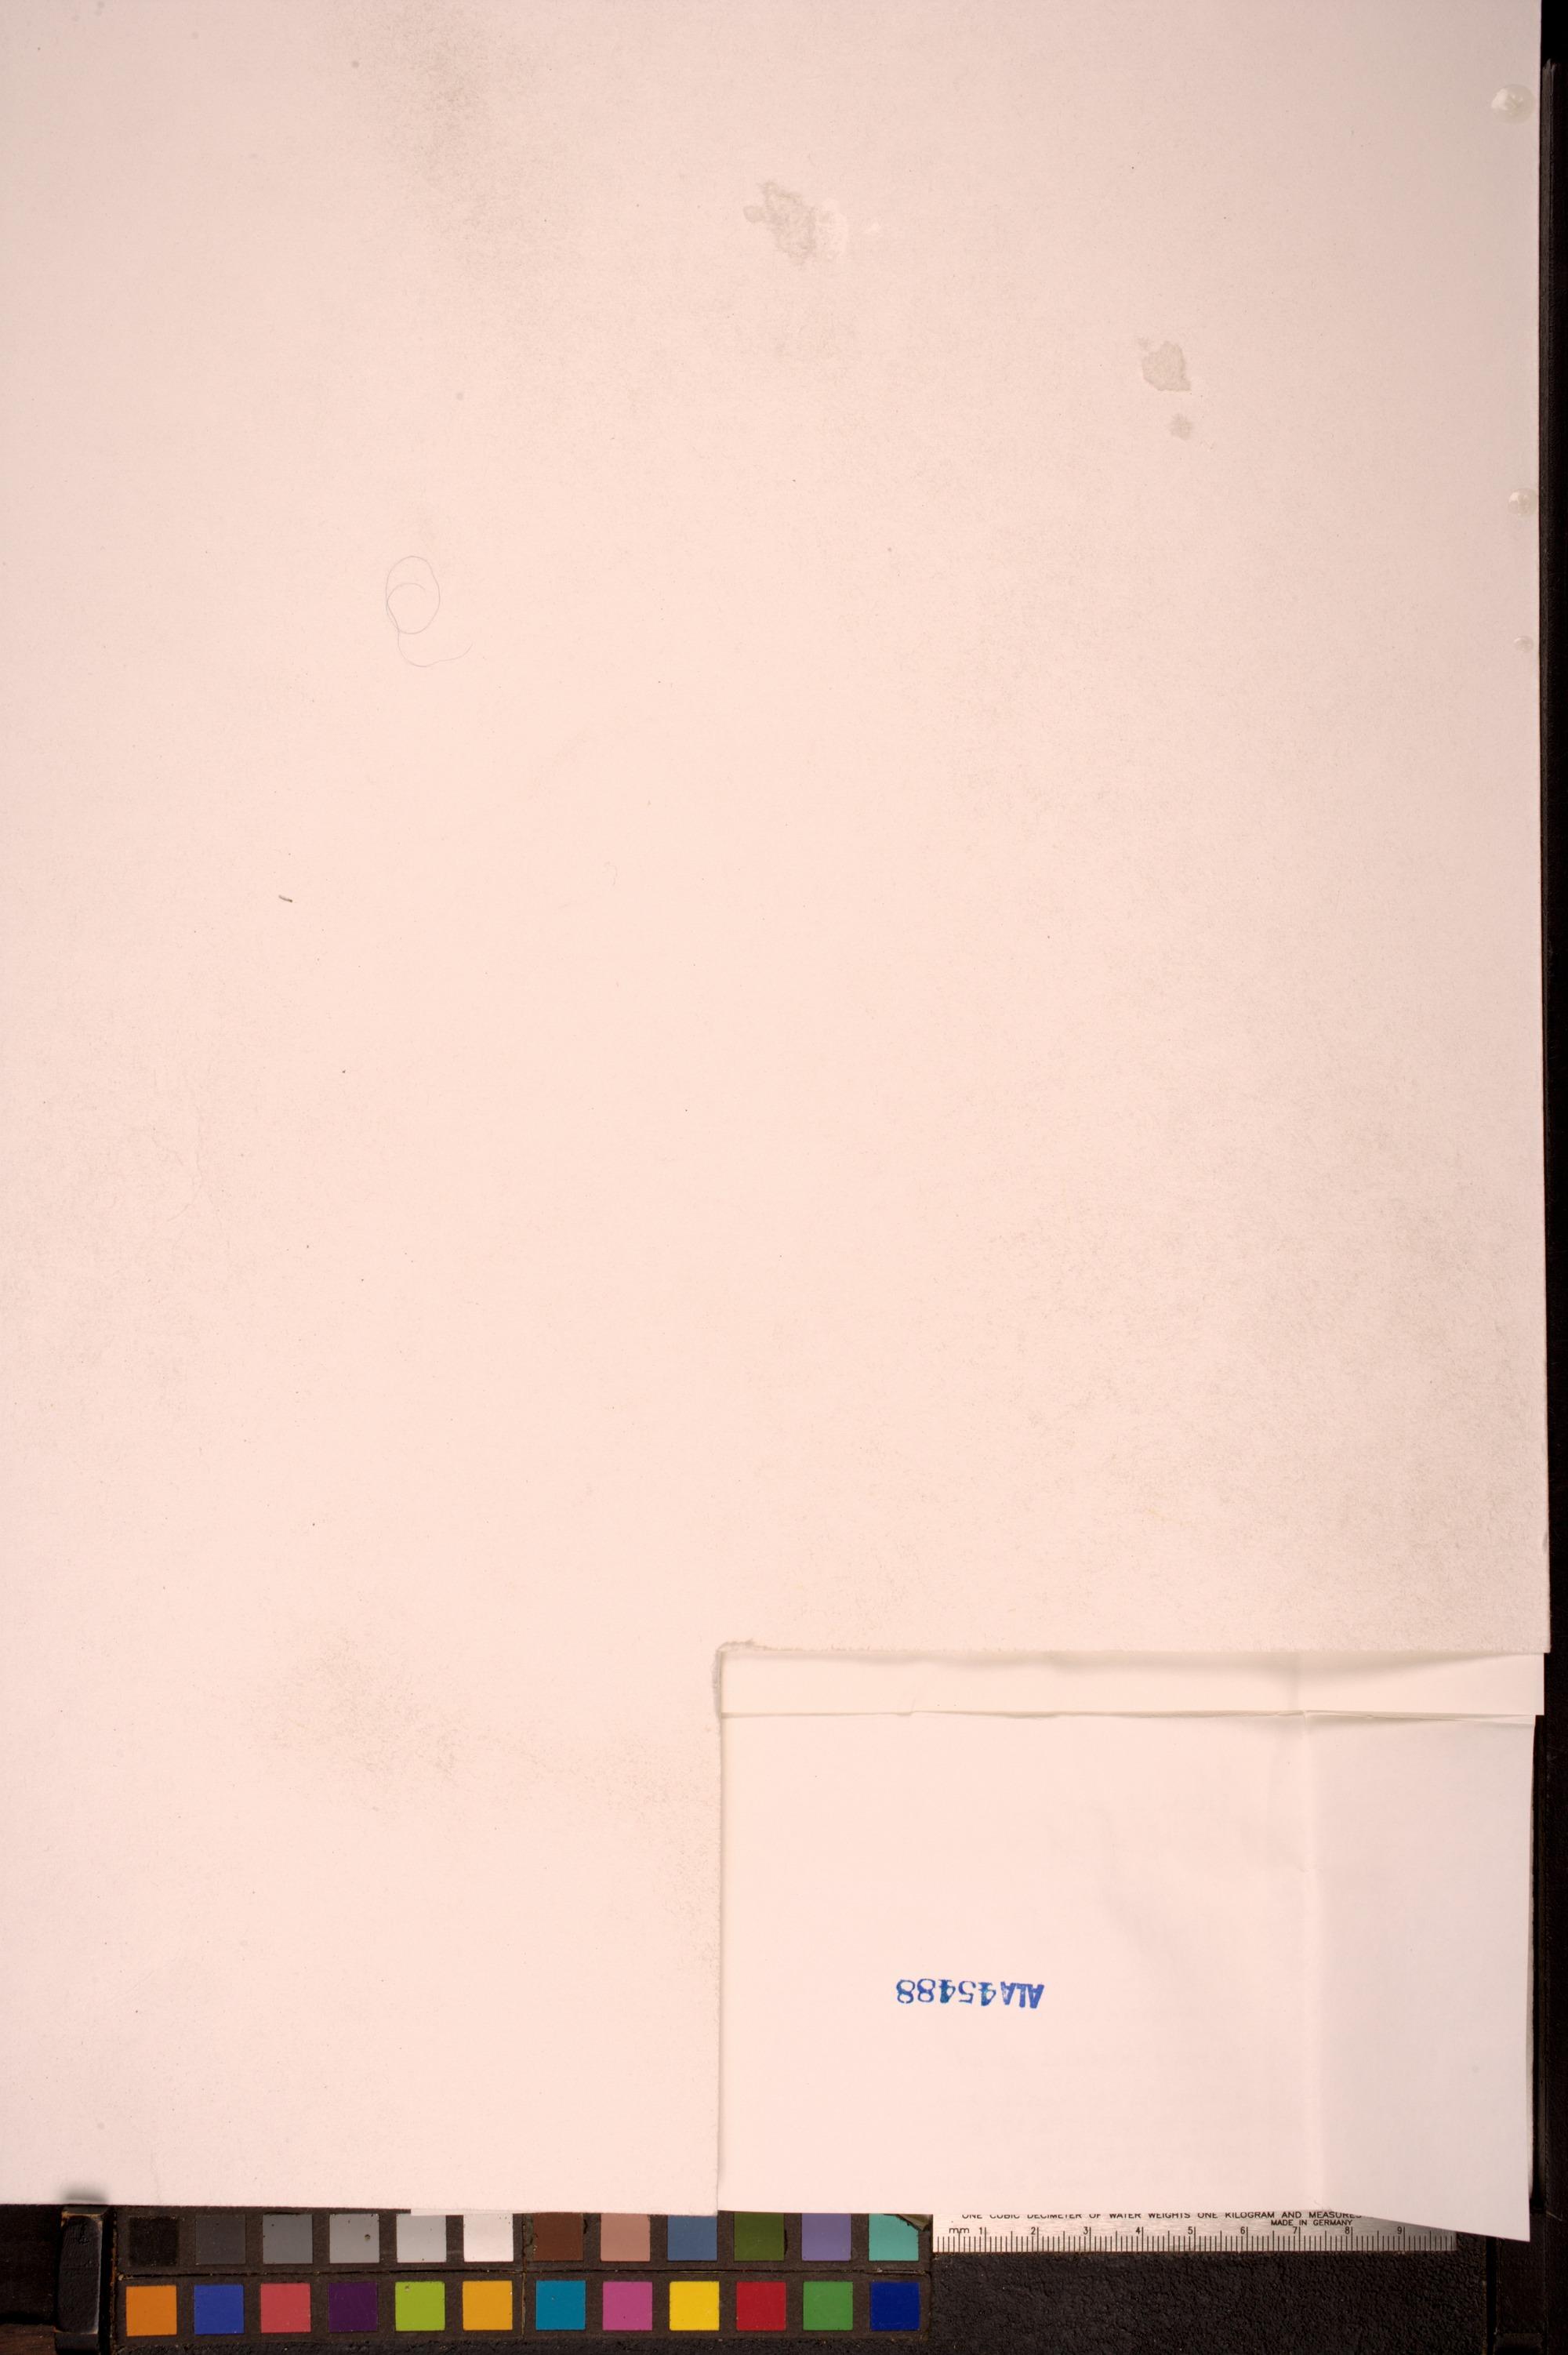 Aspicilia fimbriata image